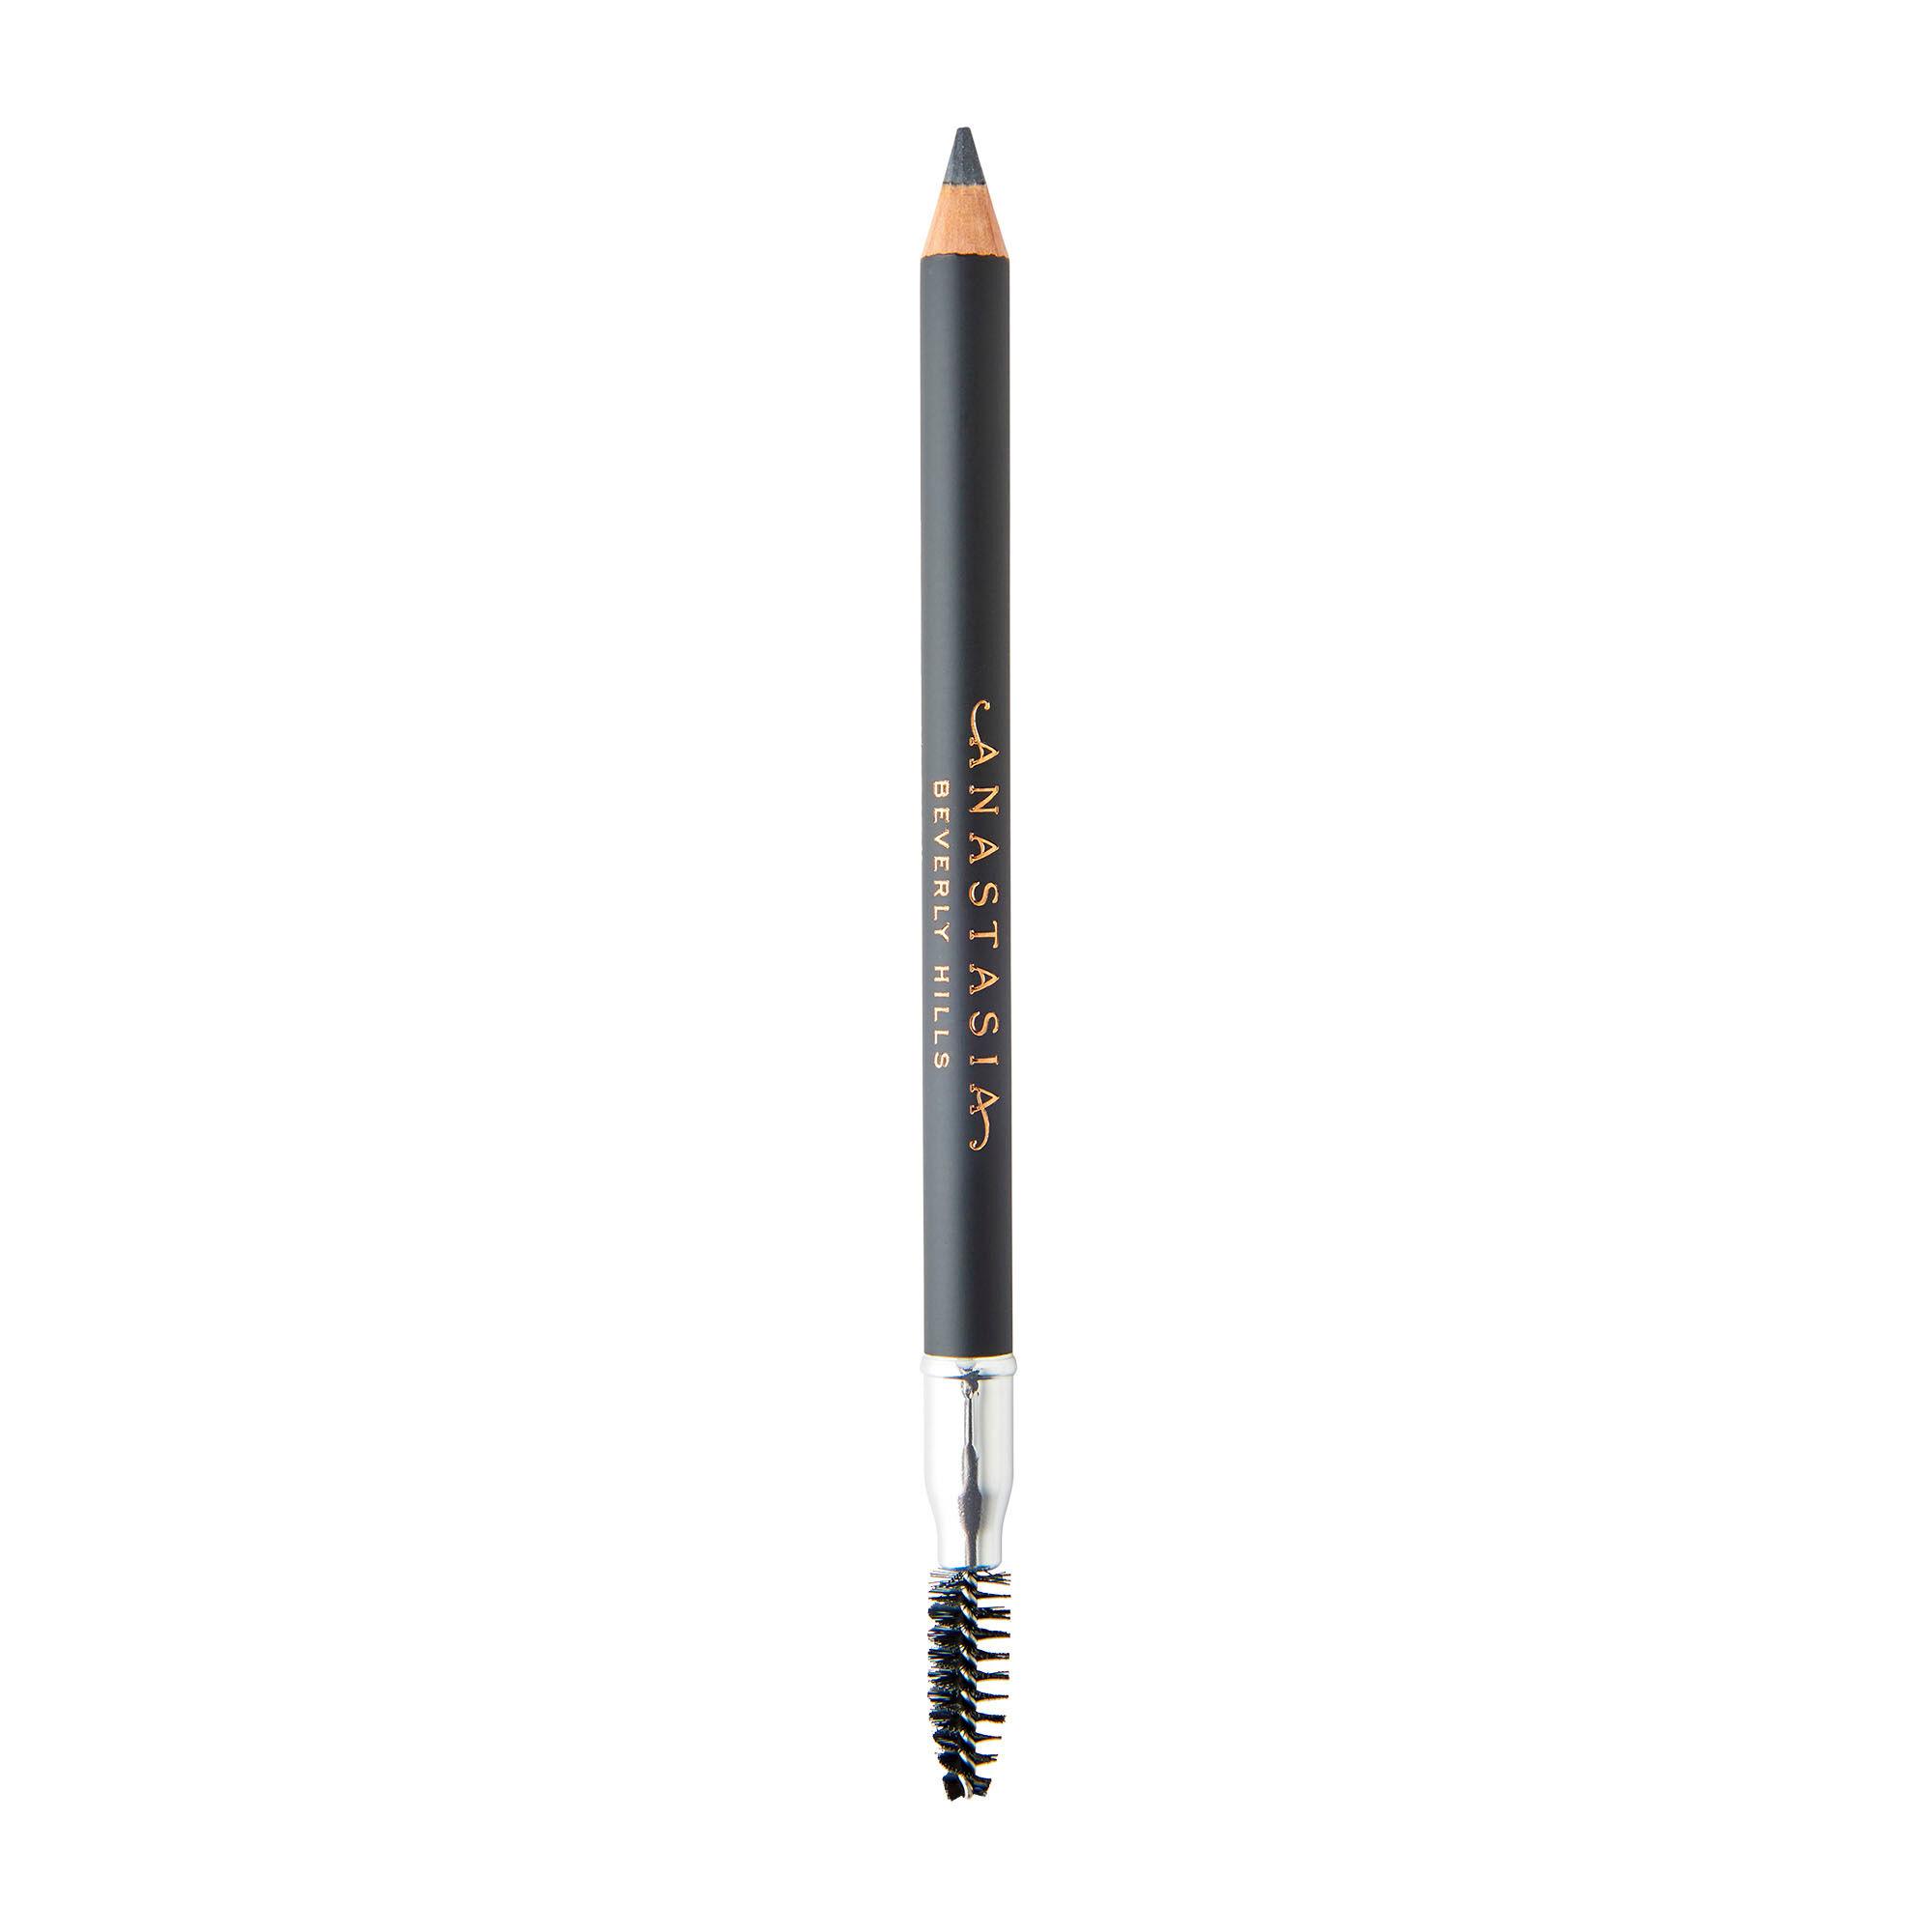 Anastasia Beverly Hills Crayon Perfect Brow Pencil Auburn Granite 1.05g